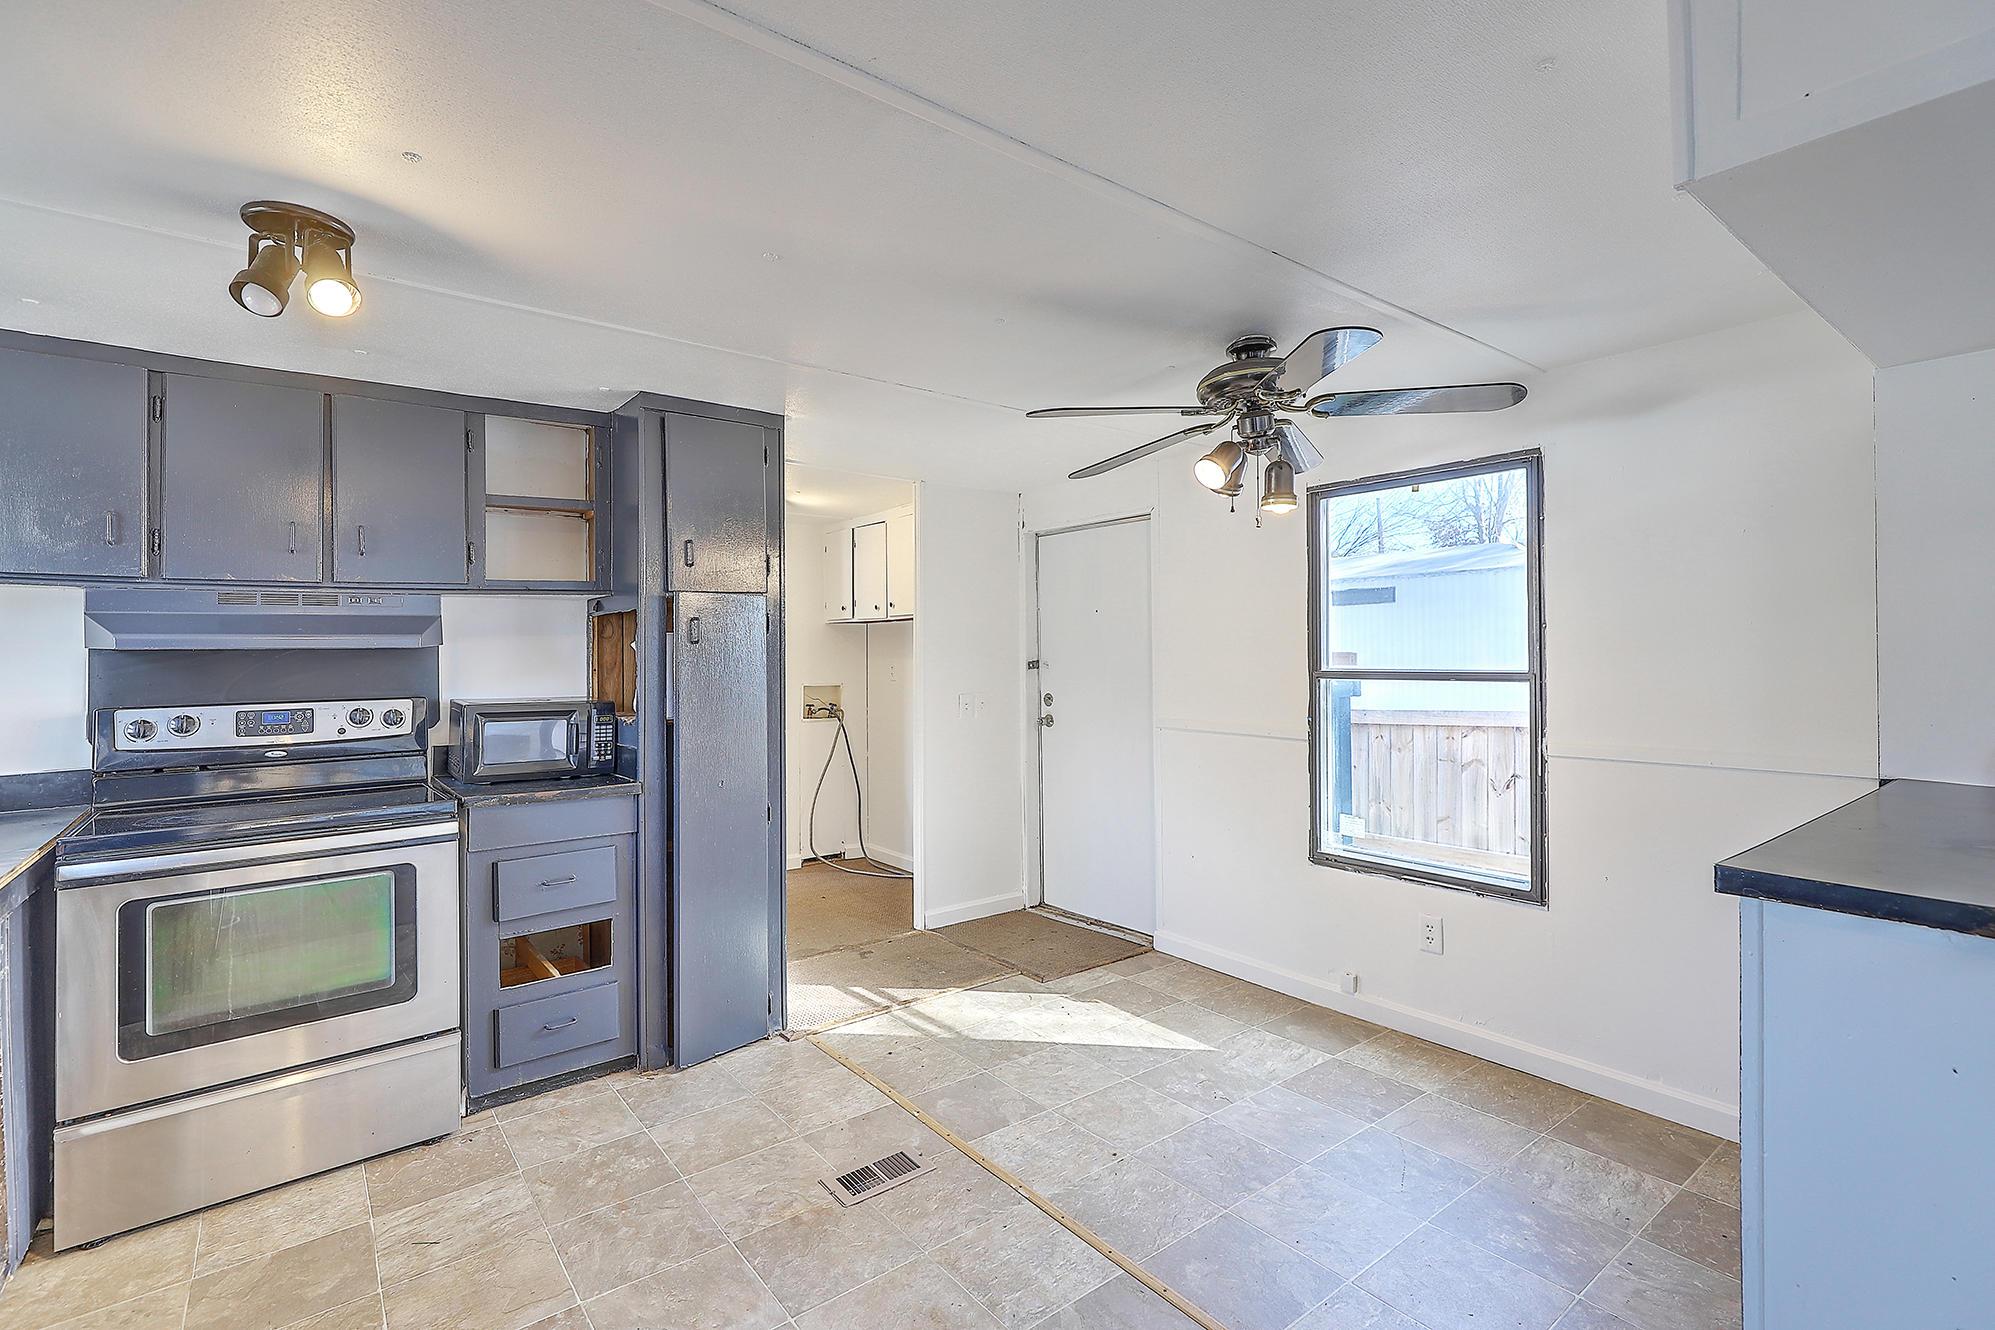 Caromi Village Homes For Sale - 323 Raymond, Ladson, SC - 6